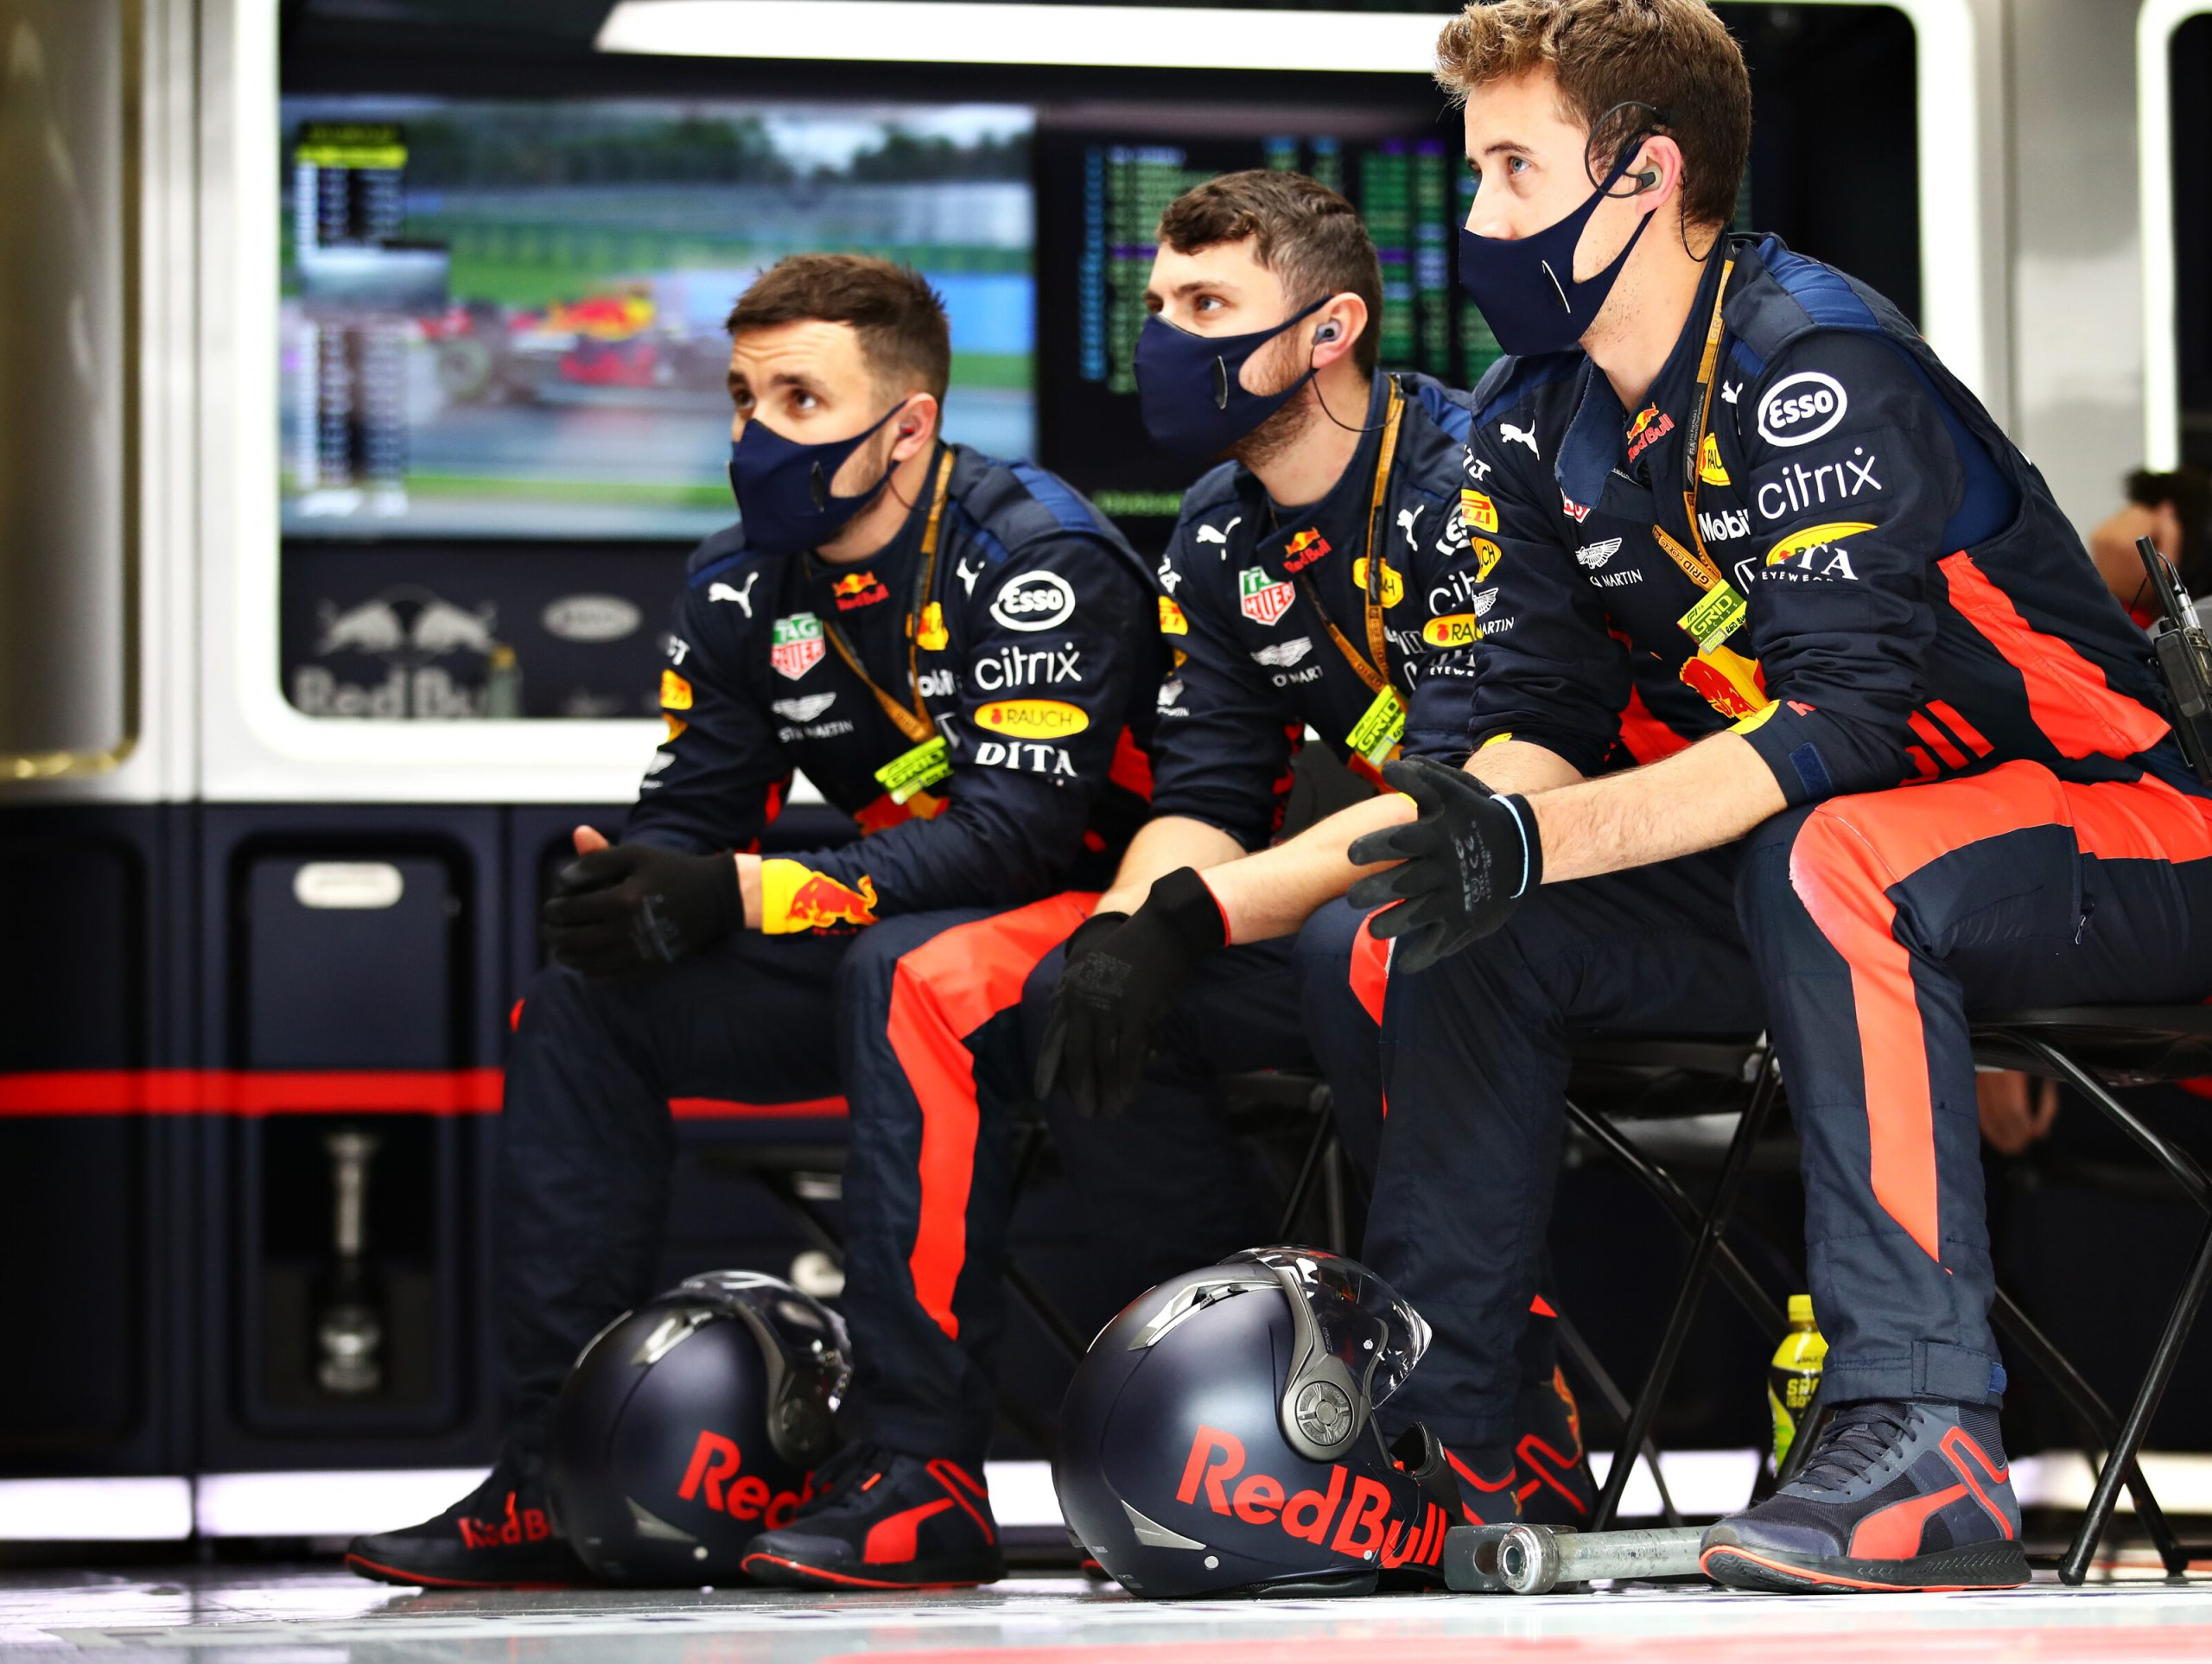 F1 - La F1 confirme trois cas positifs Covid-19 cette semaine